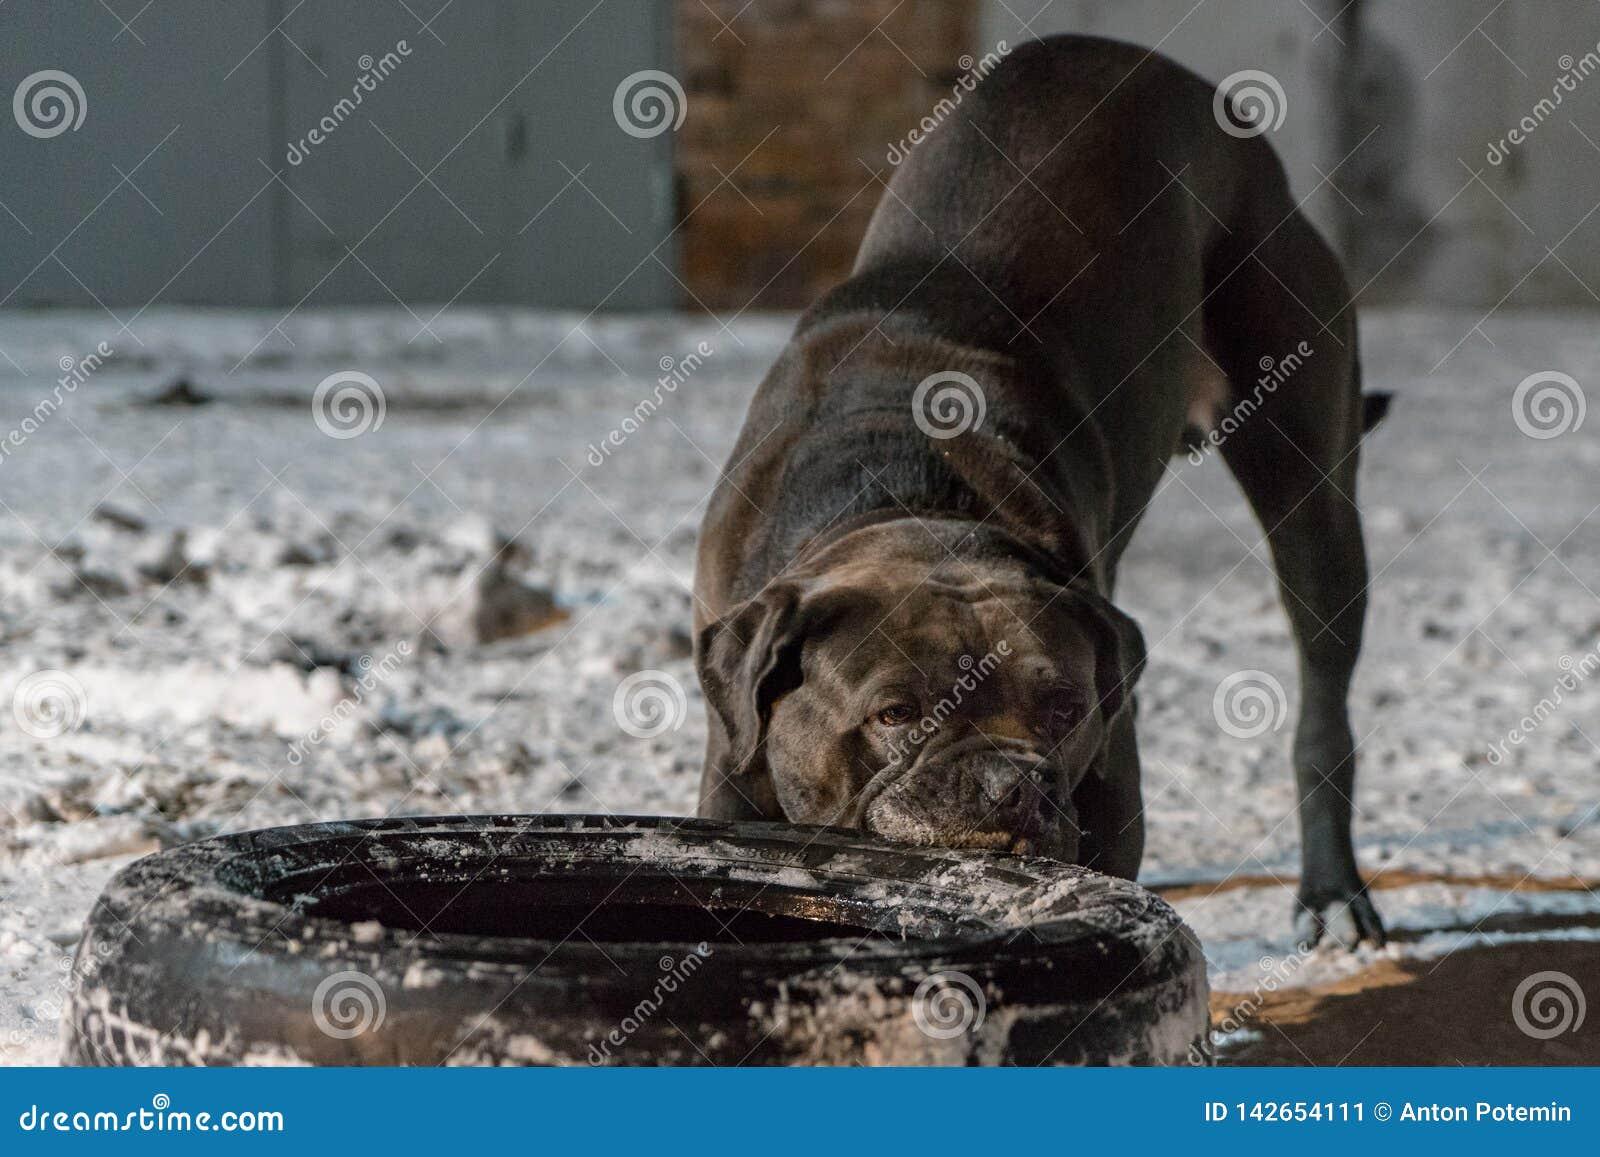 Cane corso dog pulling tire